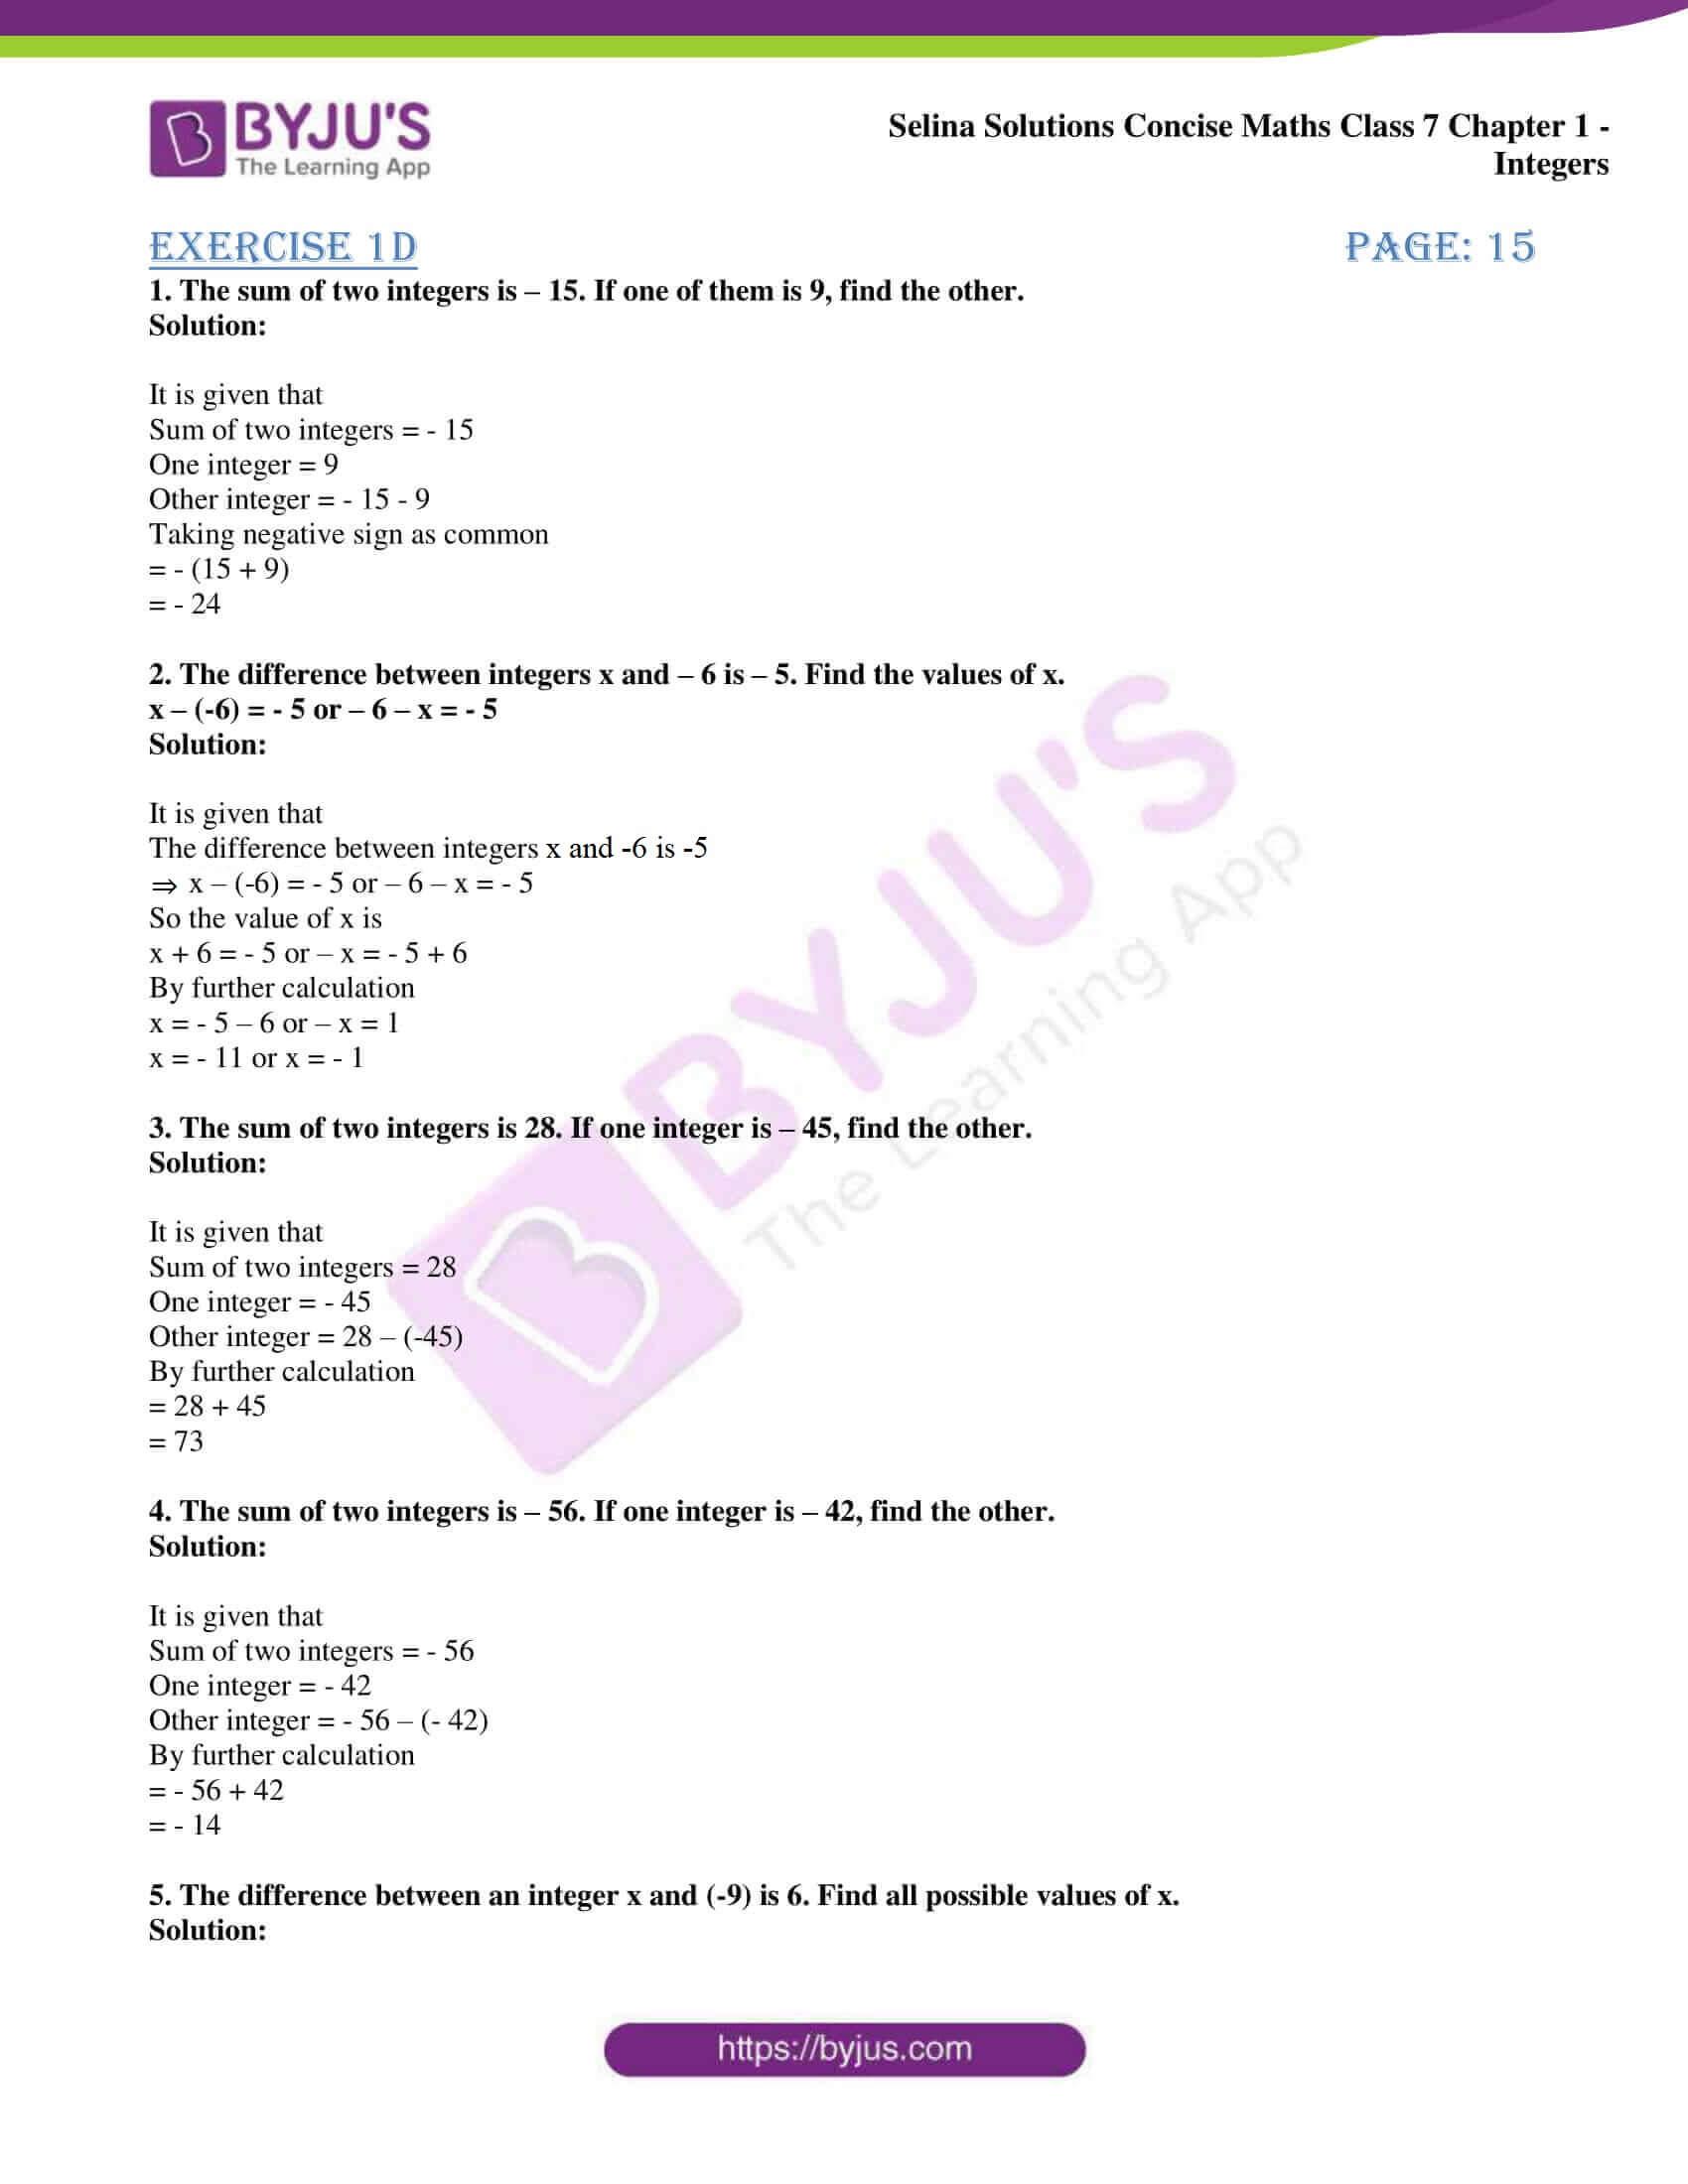 selina sol concise maths class 7 ch1 ex 1d 1